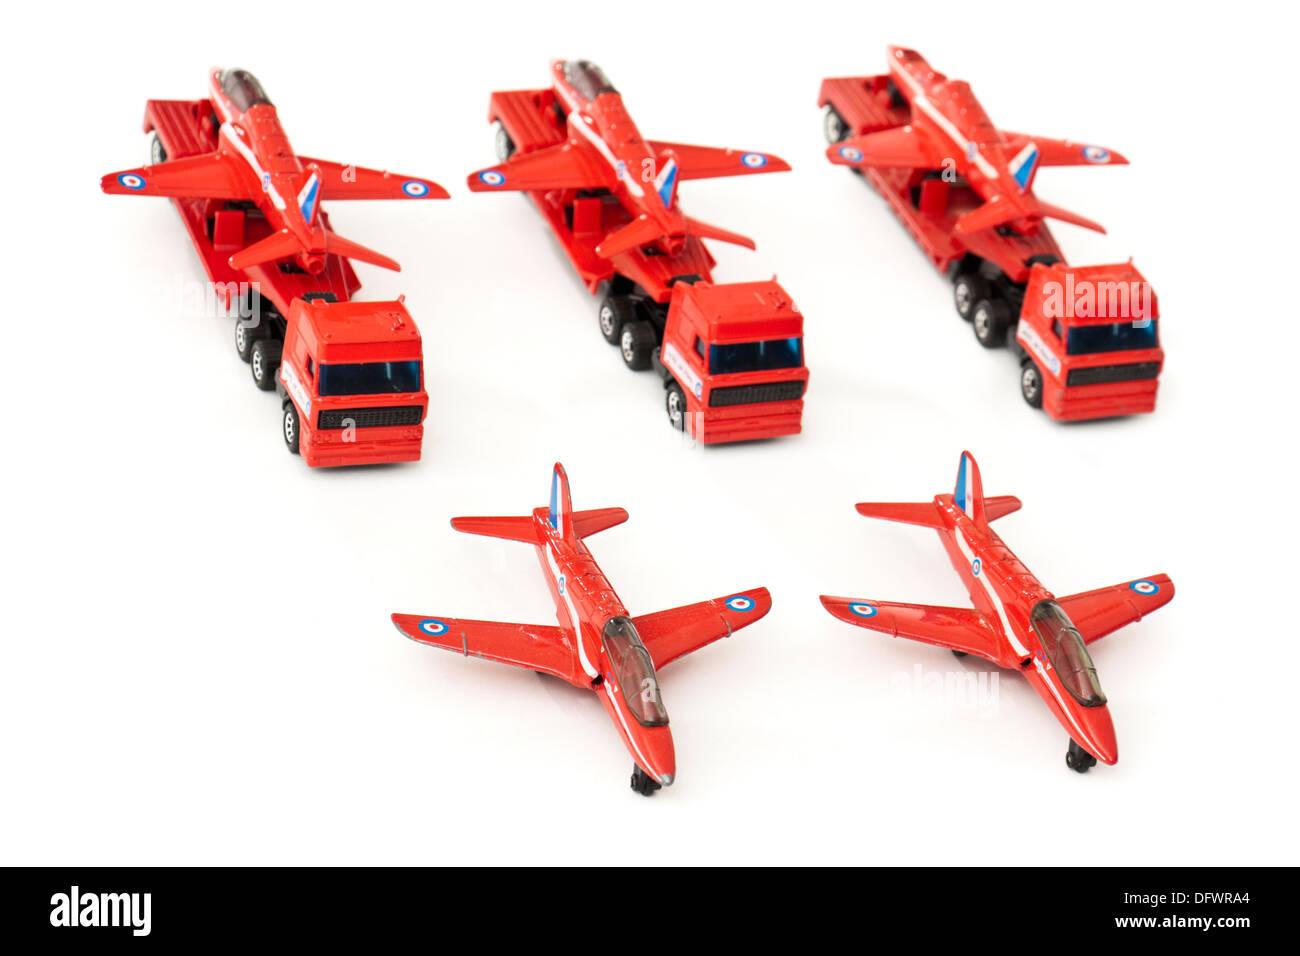 Matchbox (1991) diecast model replicas of the BAe Hawk Trainer Mk1 aeroplane on transporters - Stock Image